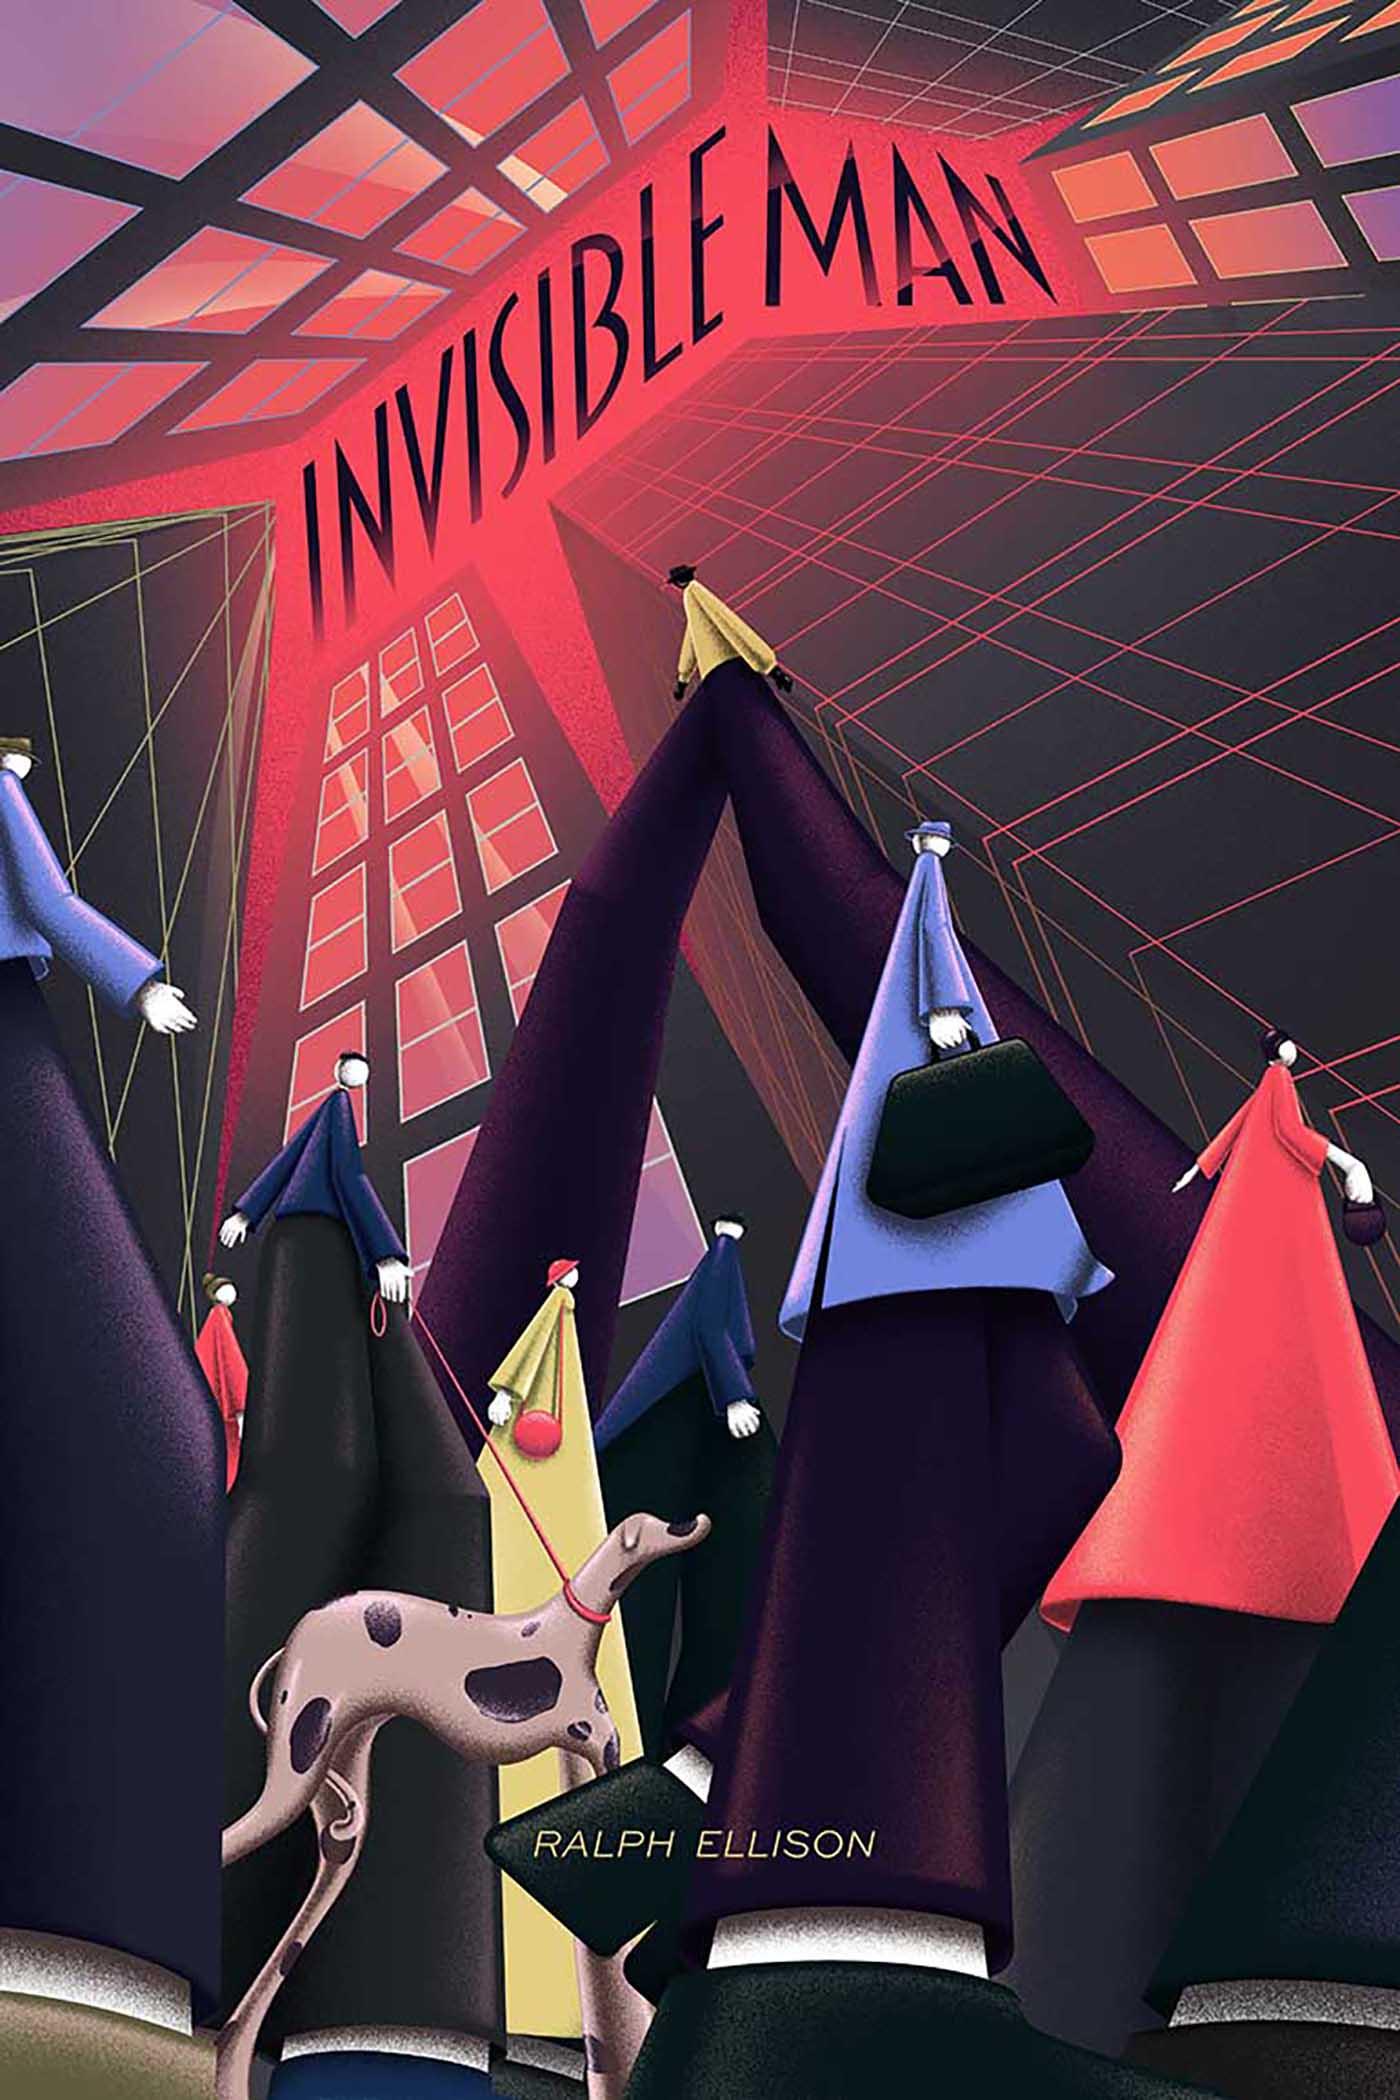 Richard Solomon - Carlos-Miranda-010-Invisible Man